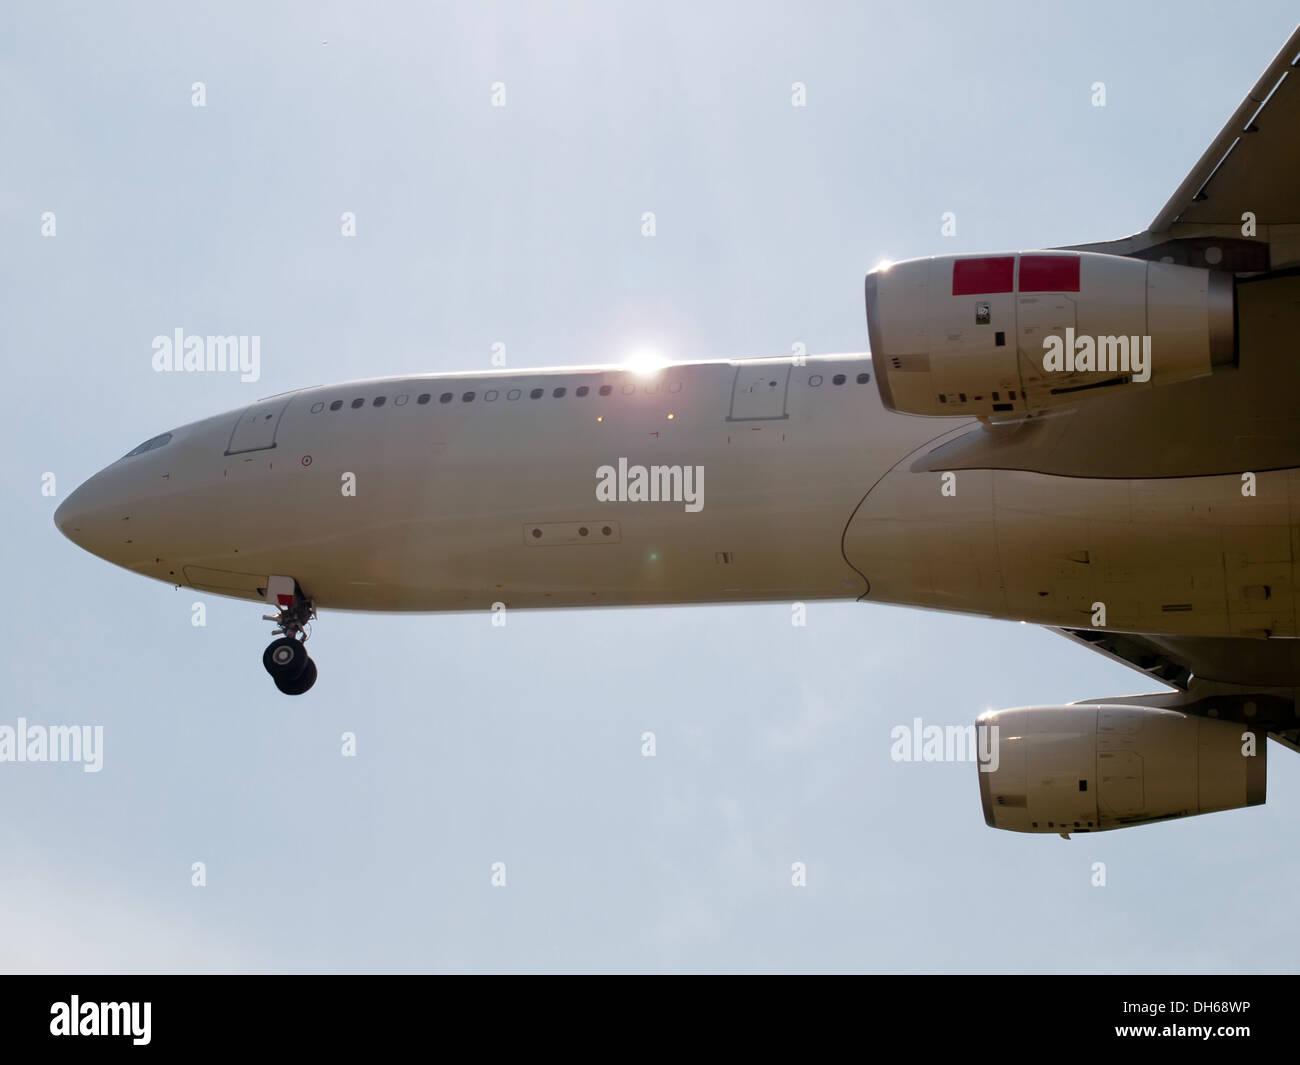 detail of landing airplane - side view - Stock Image